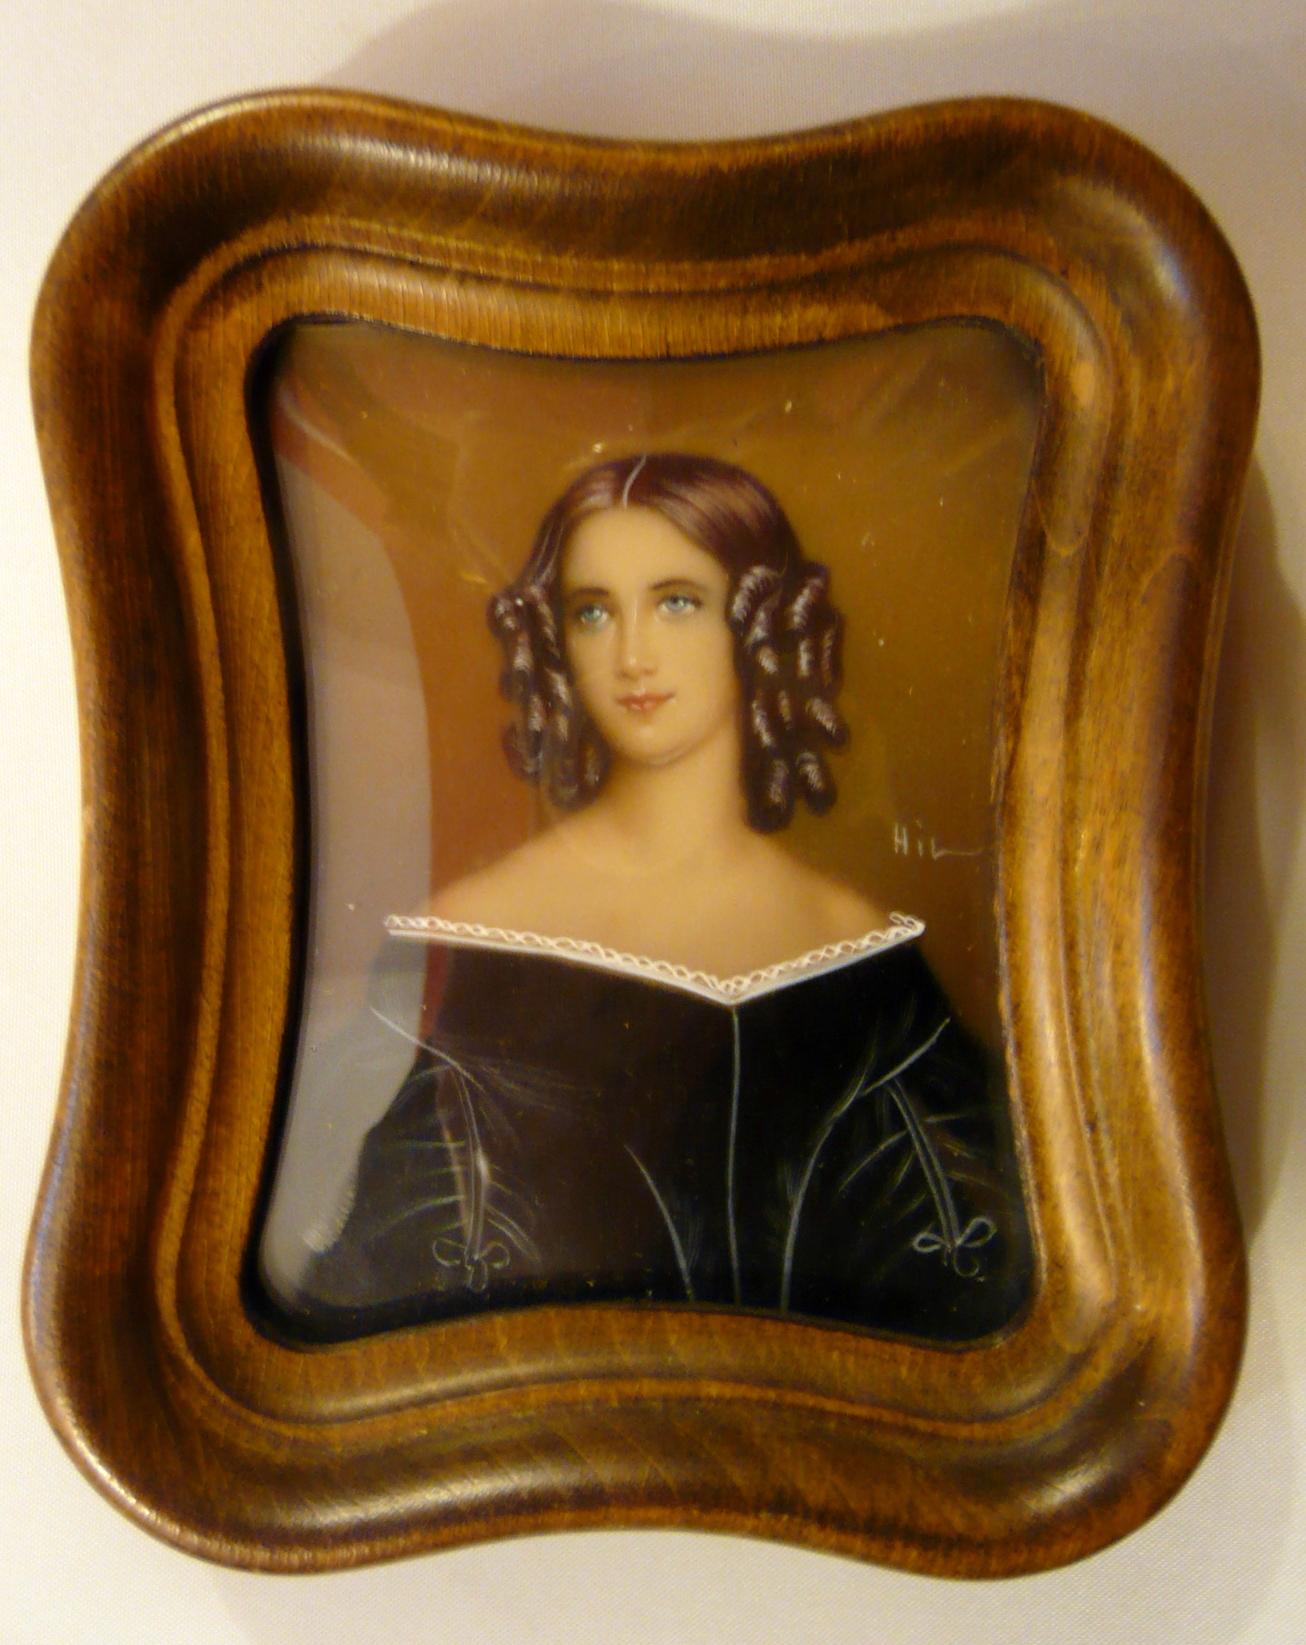 Biedermeier női arckép, miniatűr